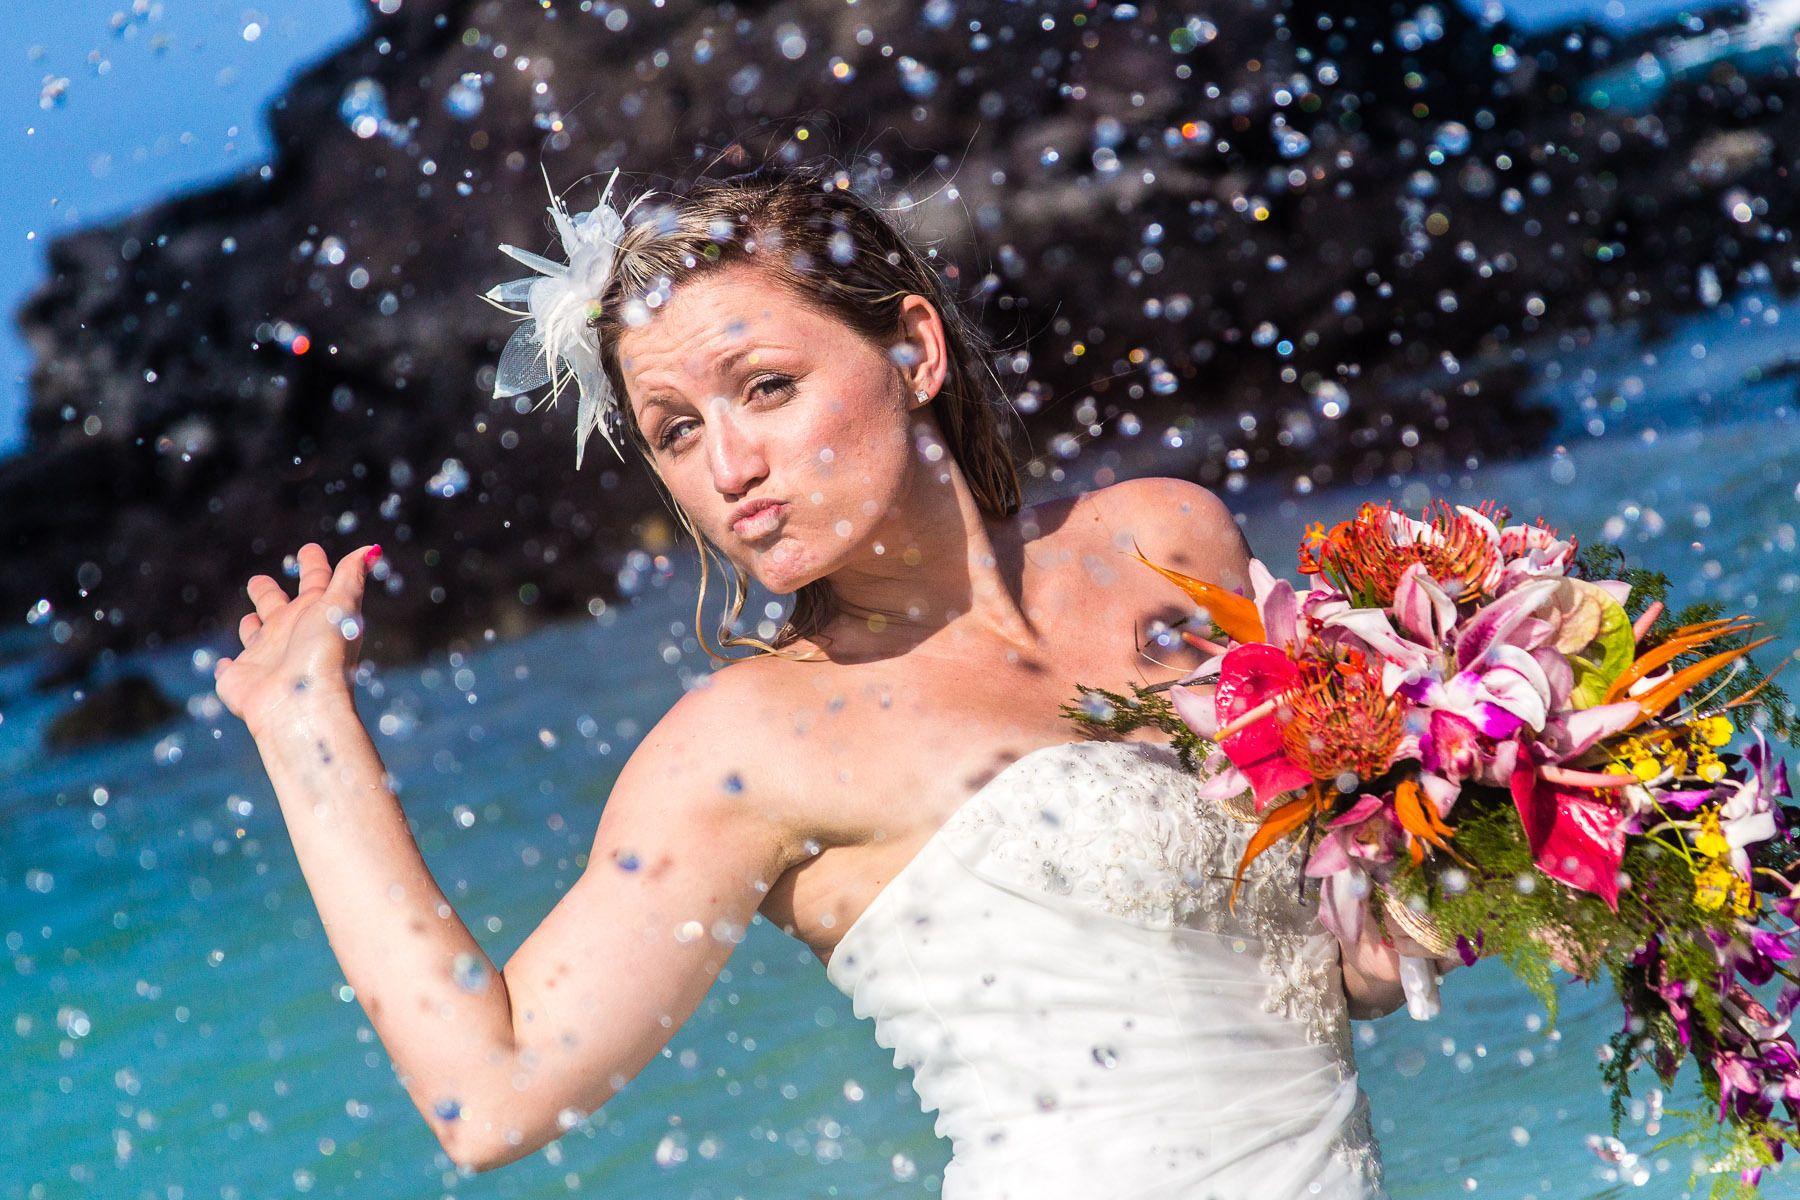 1kailua_kona__honolulu__hawaii__wedding__photographer_1473